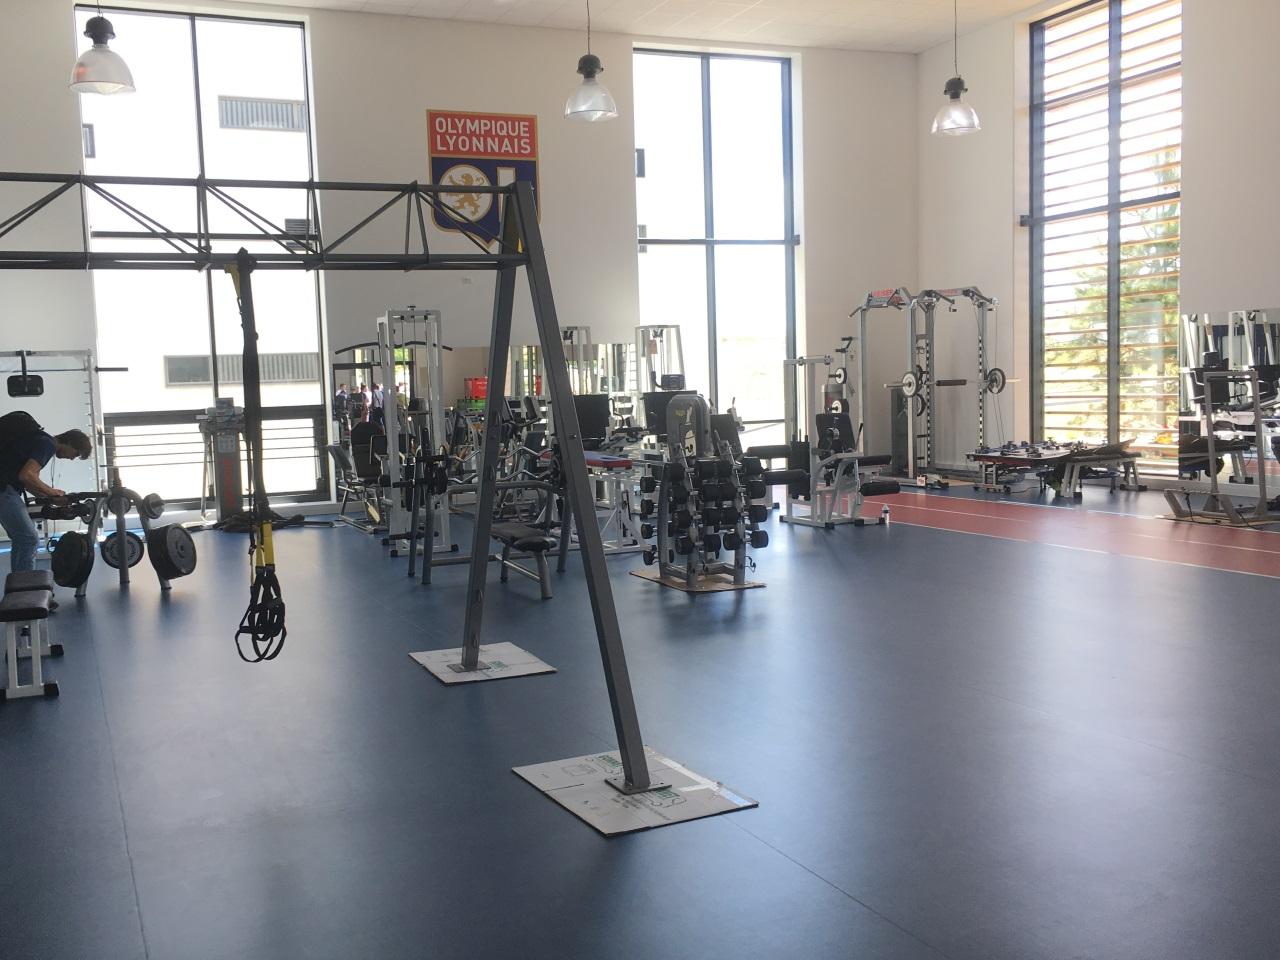 Salle de musculation - LyonMag